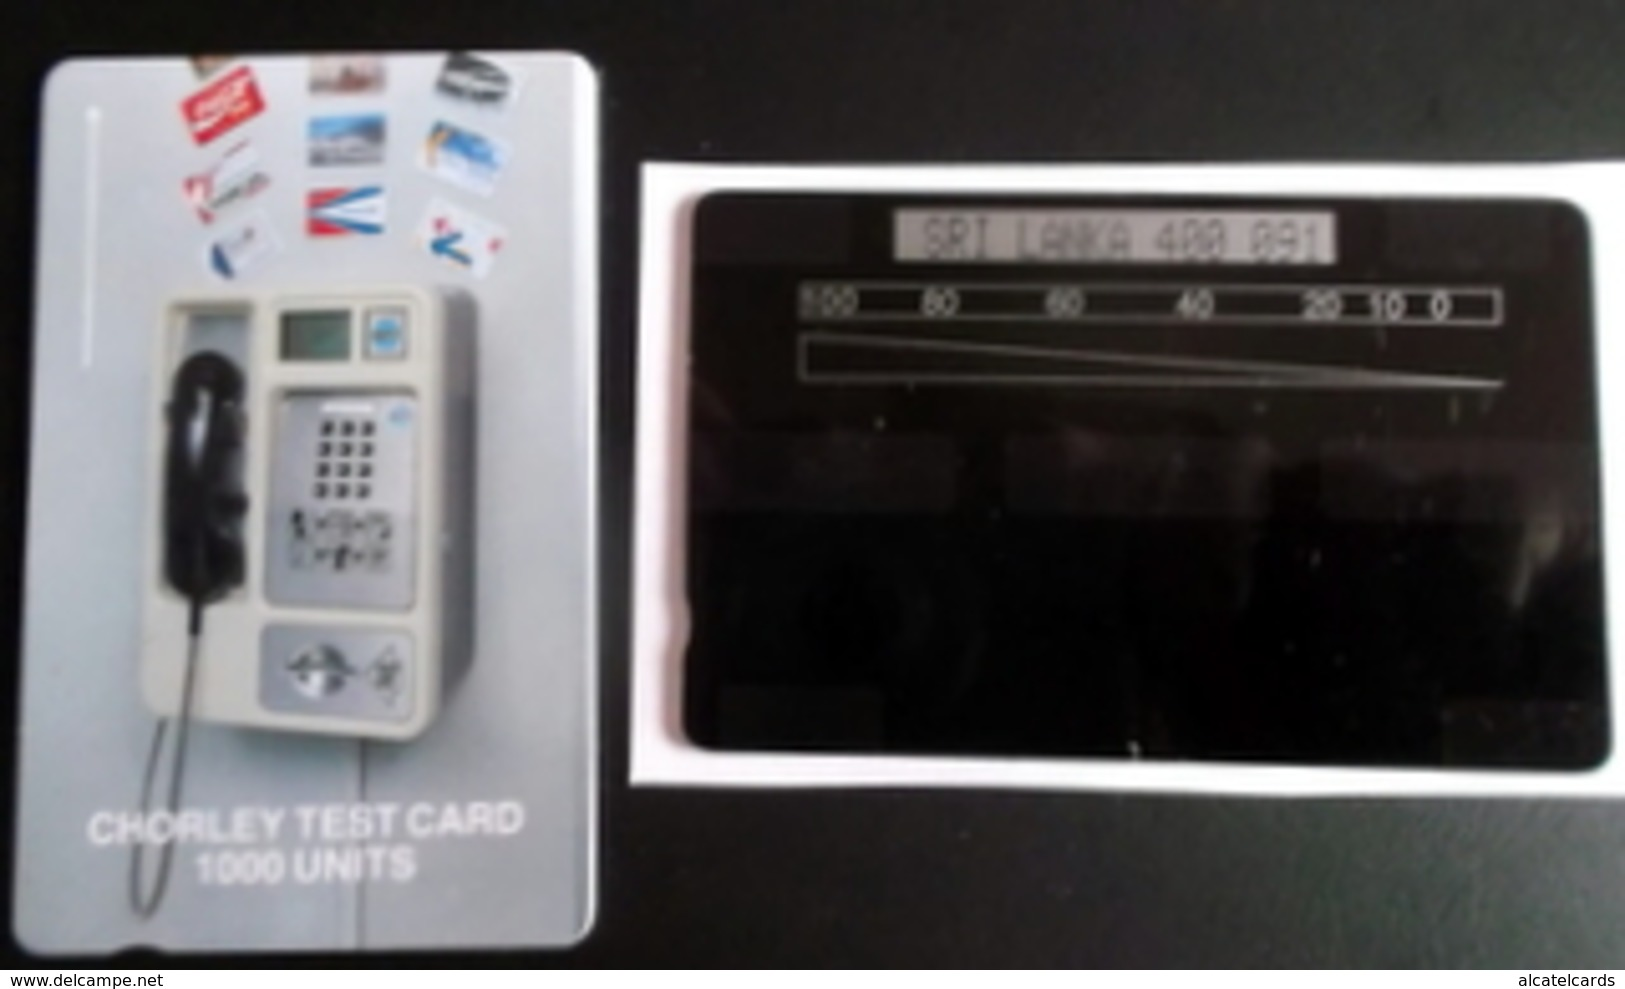 10 TEST CHORLEY - Phonecards